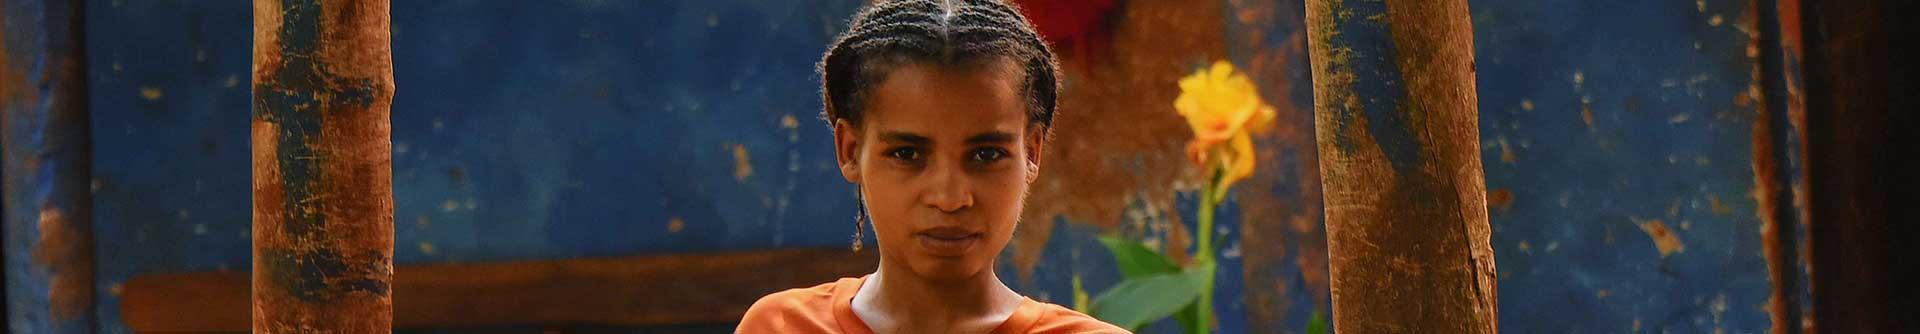 Ethiopia | Family Planning 2020